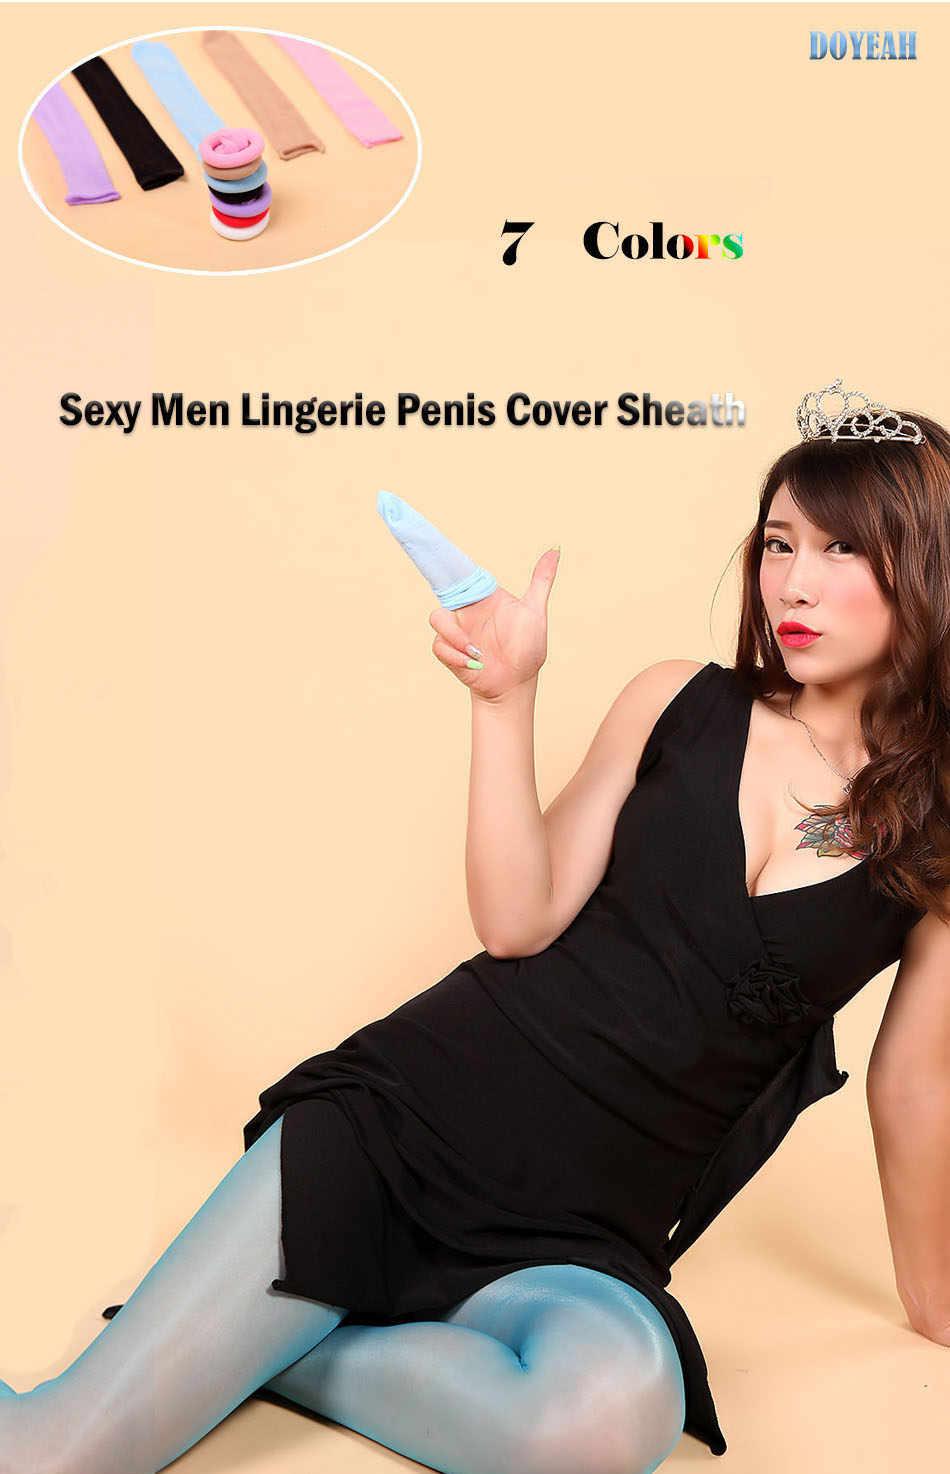 Seamless Unopen Sexy Men Lingerie Penis Cover Sheath 7 Colors Gay Underwear Panties Sex Toys DOYEAH 0638